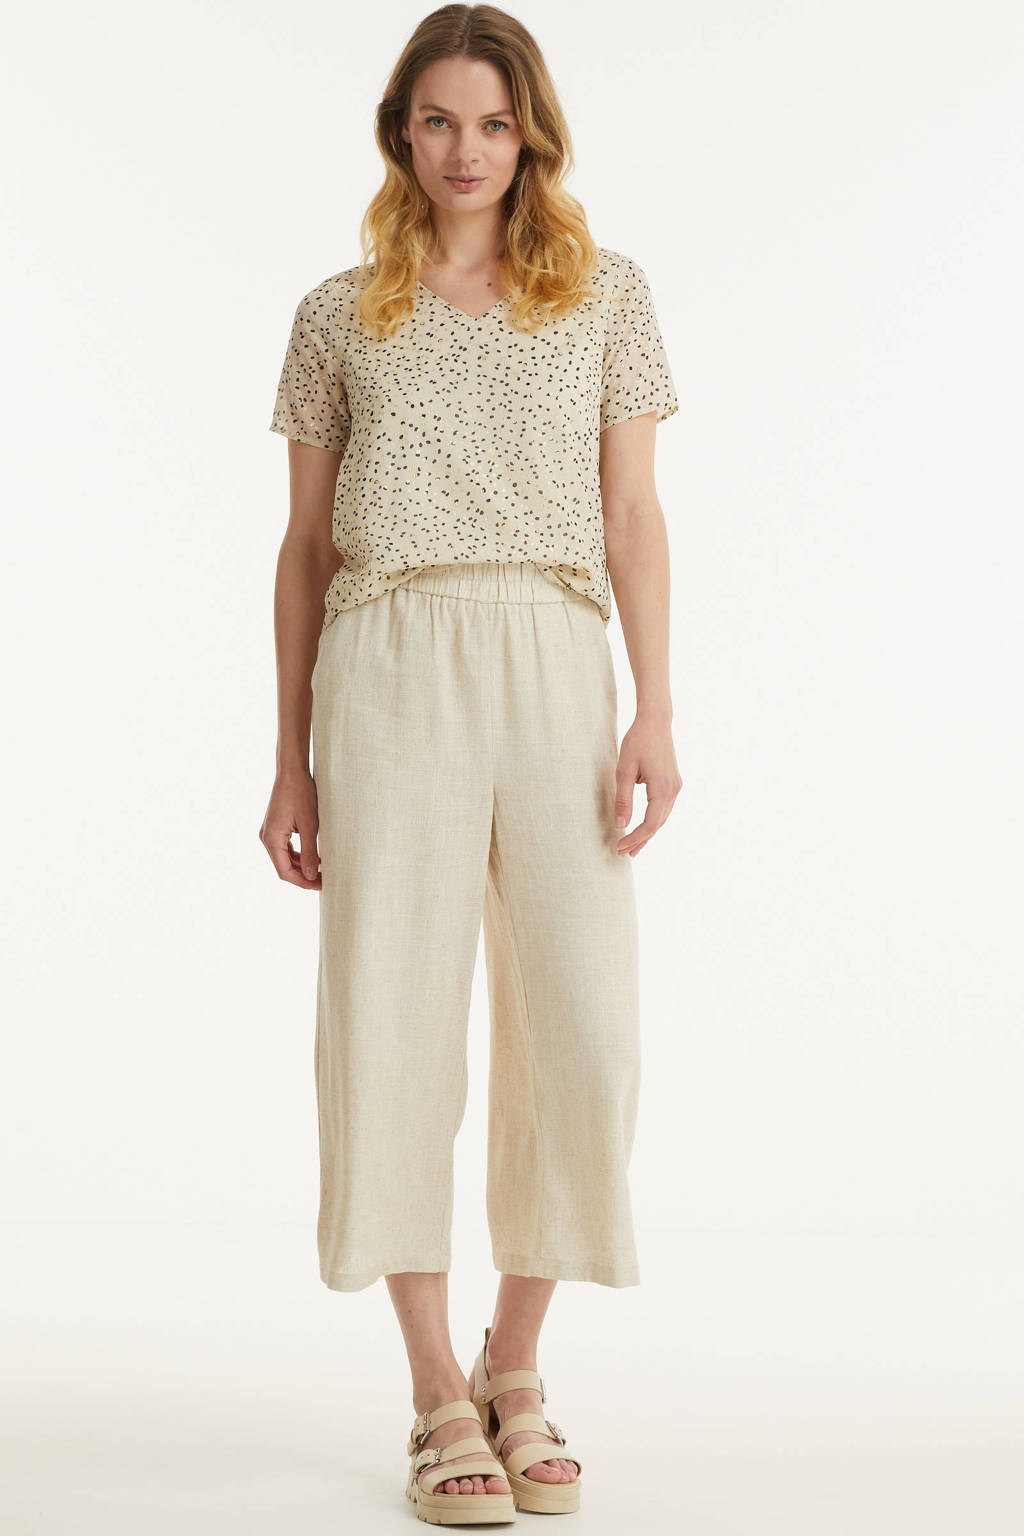 PIECES gemêleerde cropped high waist loose fit broek PCTONI HW CULOTTE ecru, Ecru